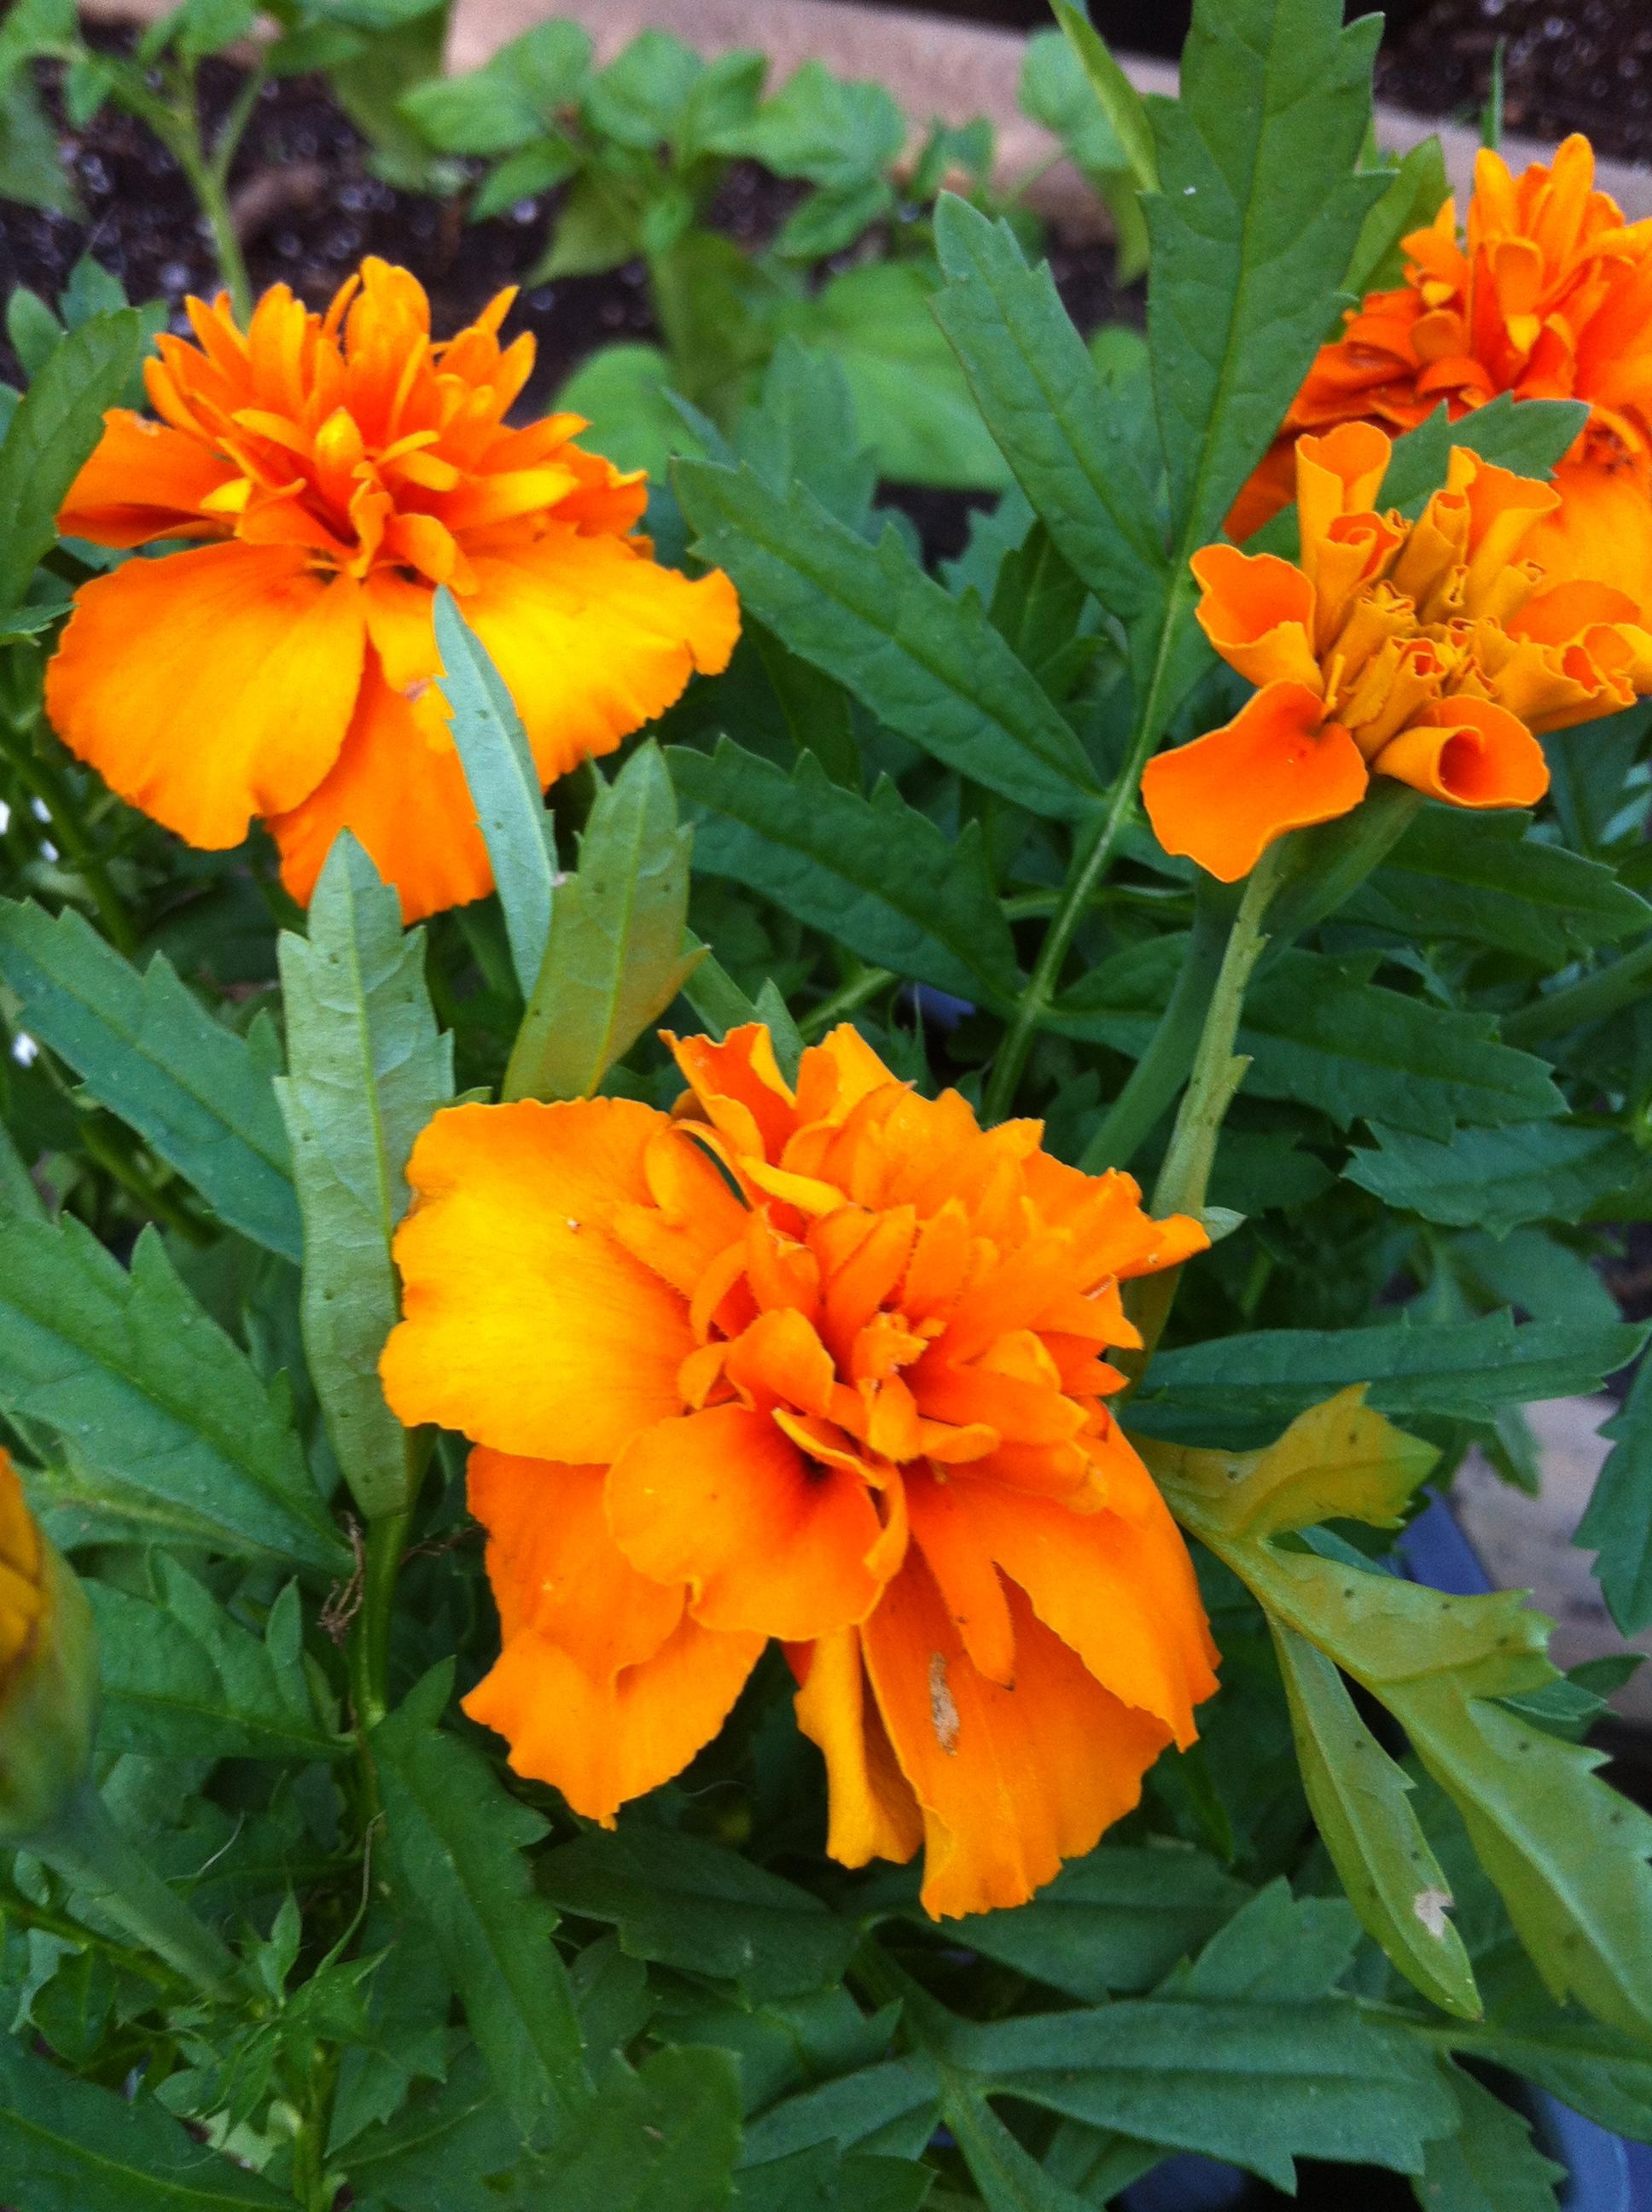 The Marigold Tarot Major Arcana The: 31 Days. 31 Flowers. Teaching Kids About The Marigold